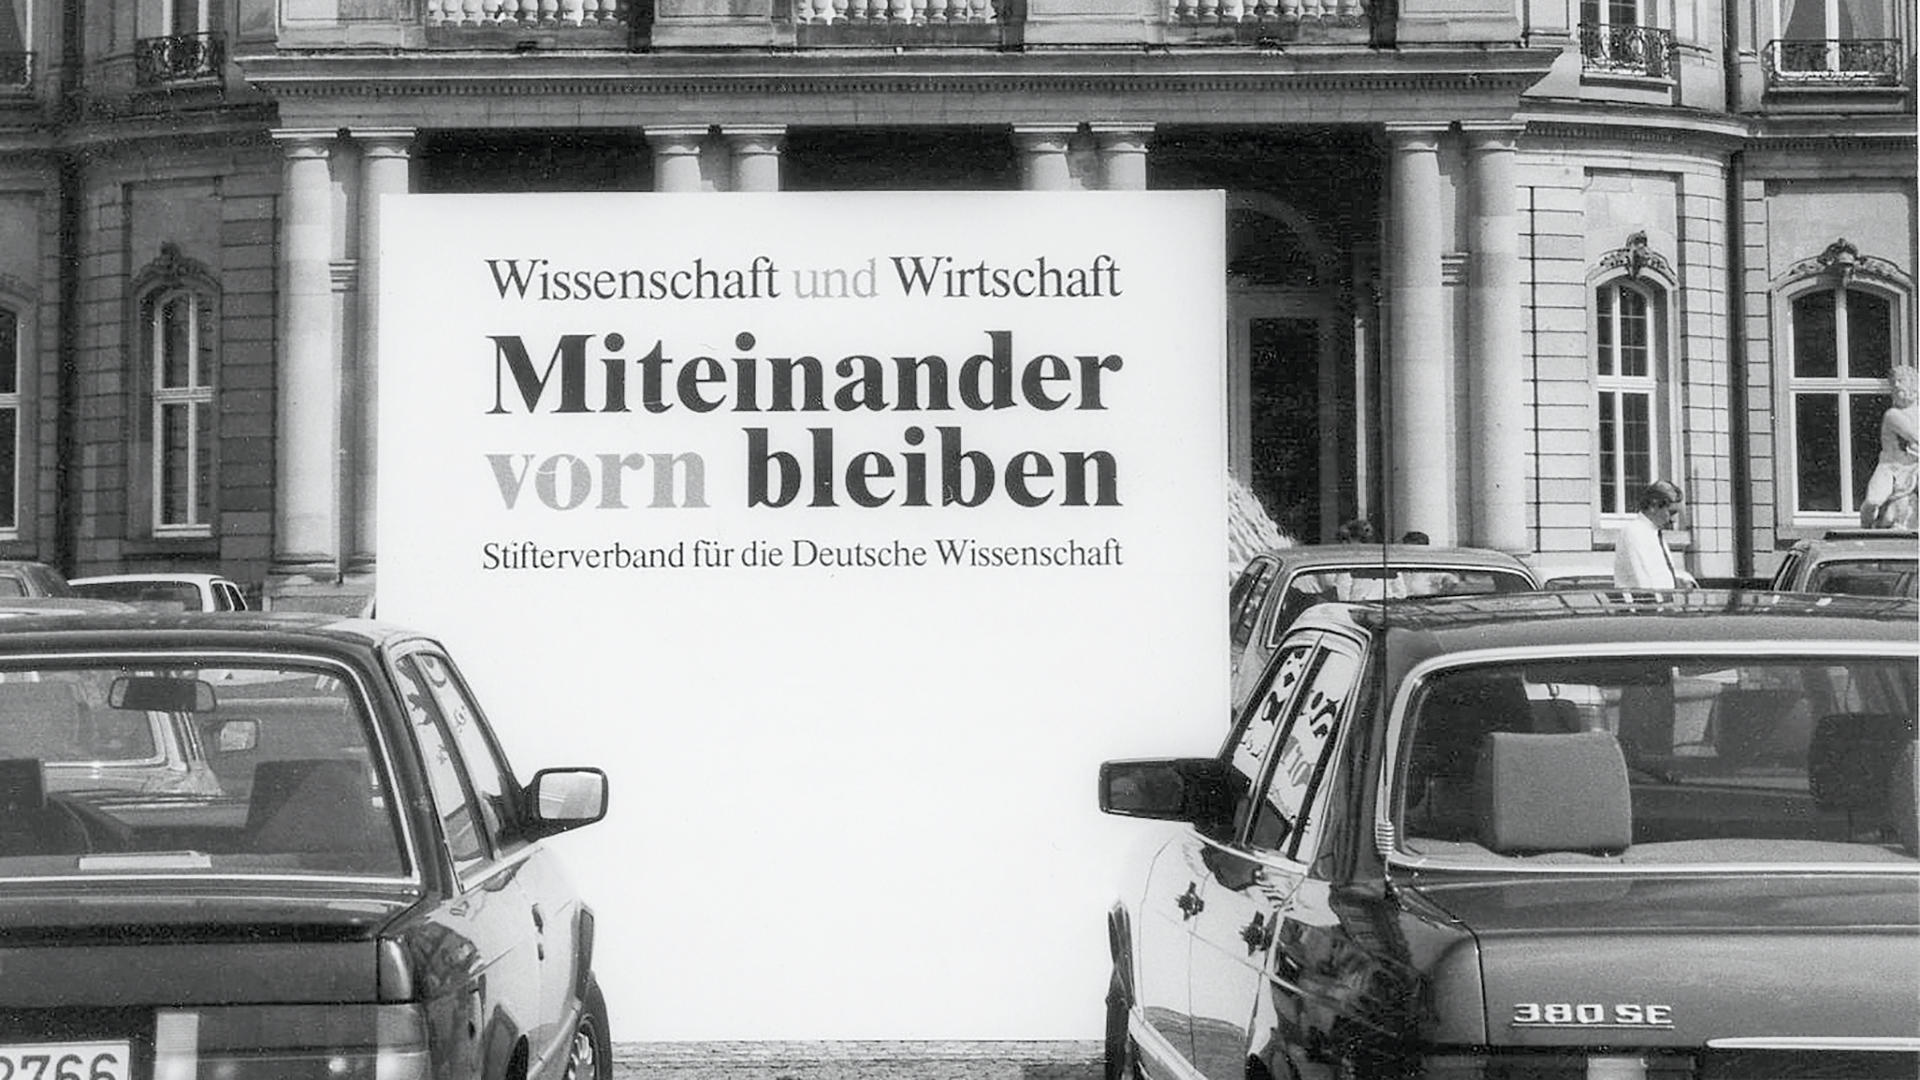 Foto: Jürgen Querbach